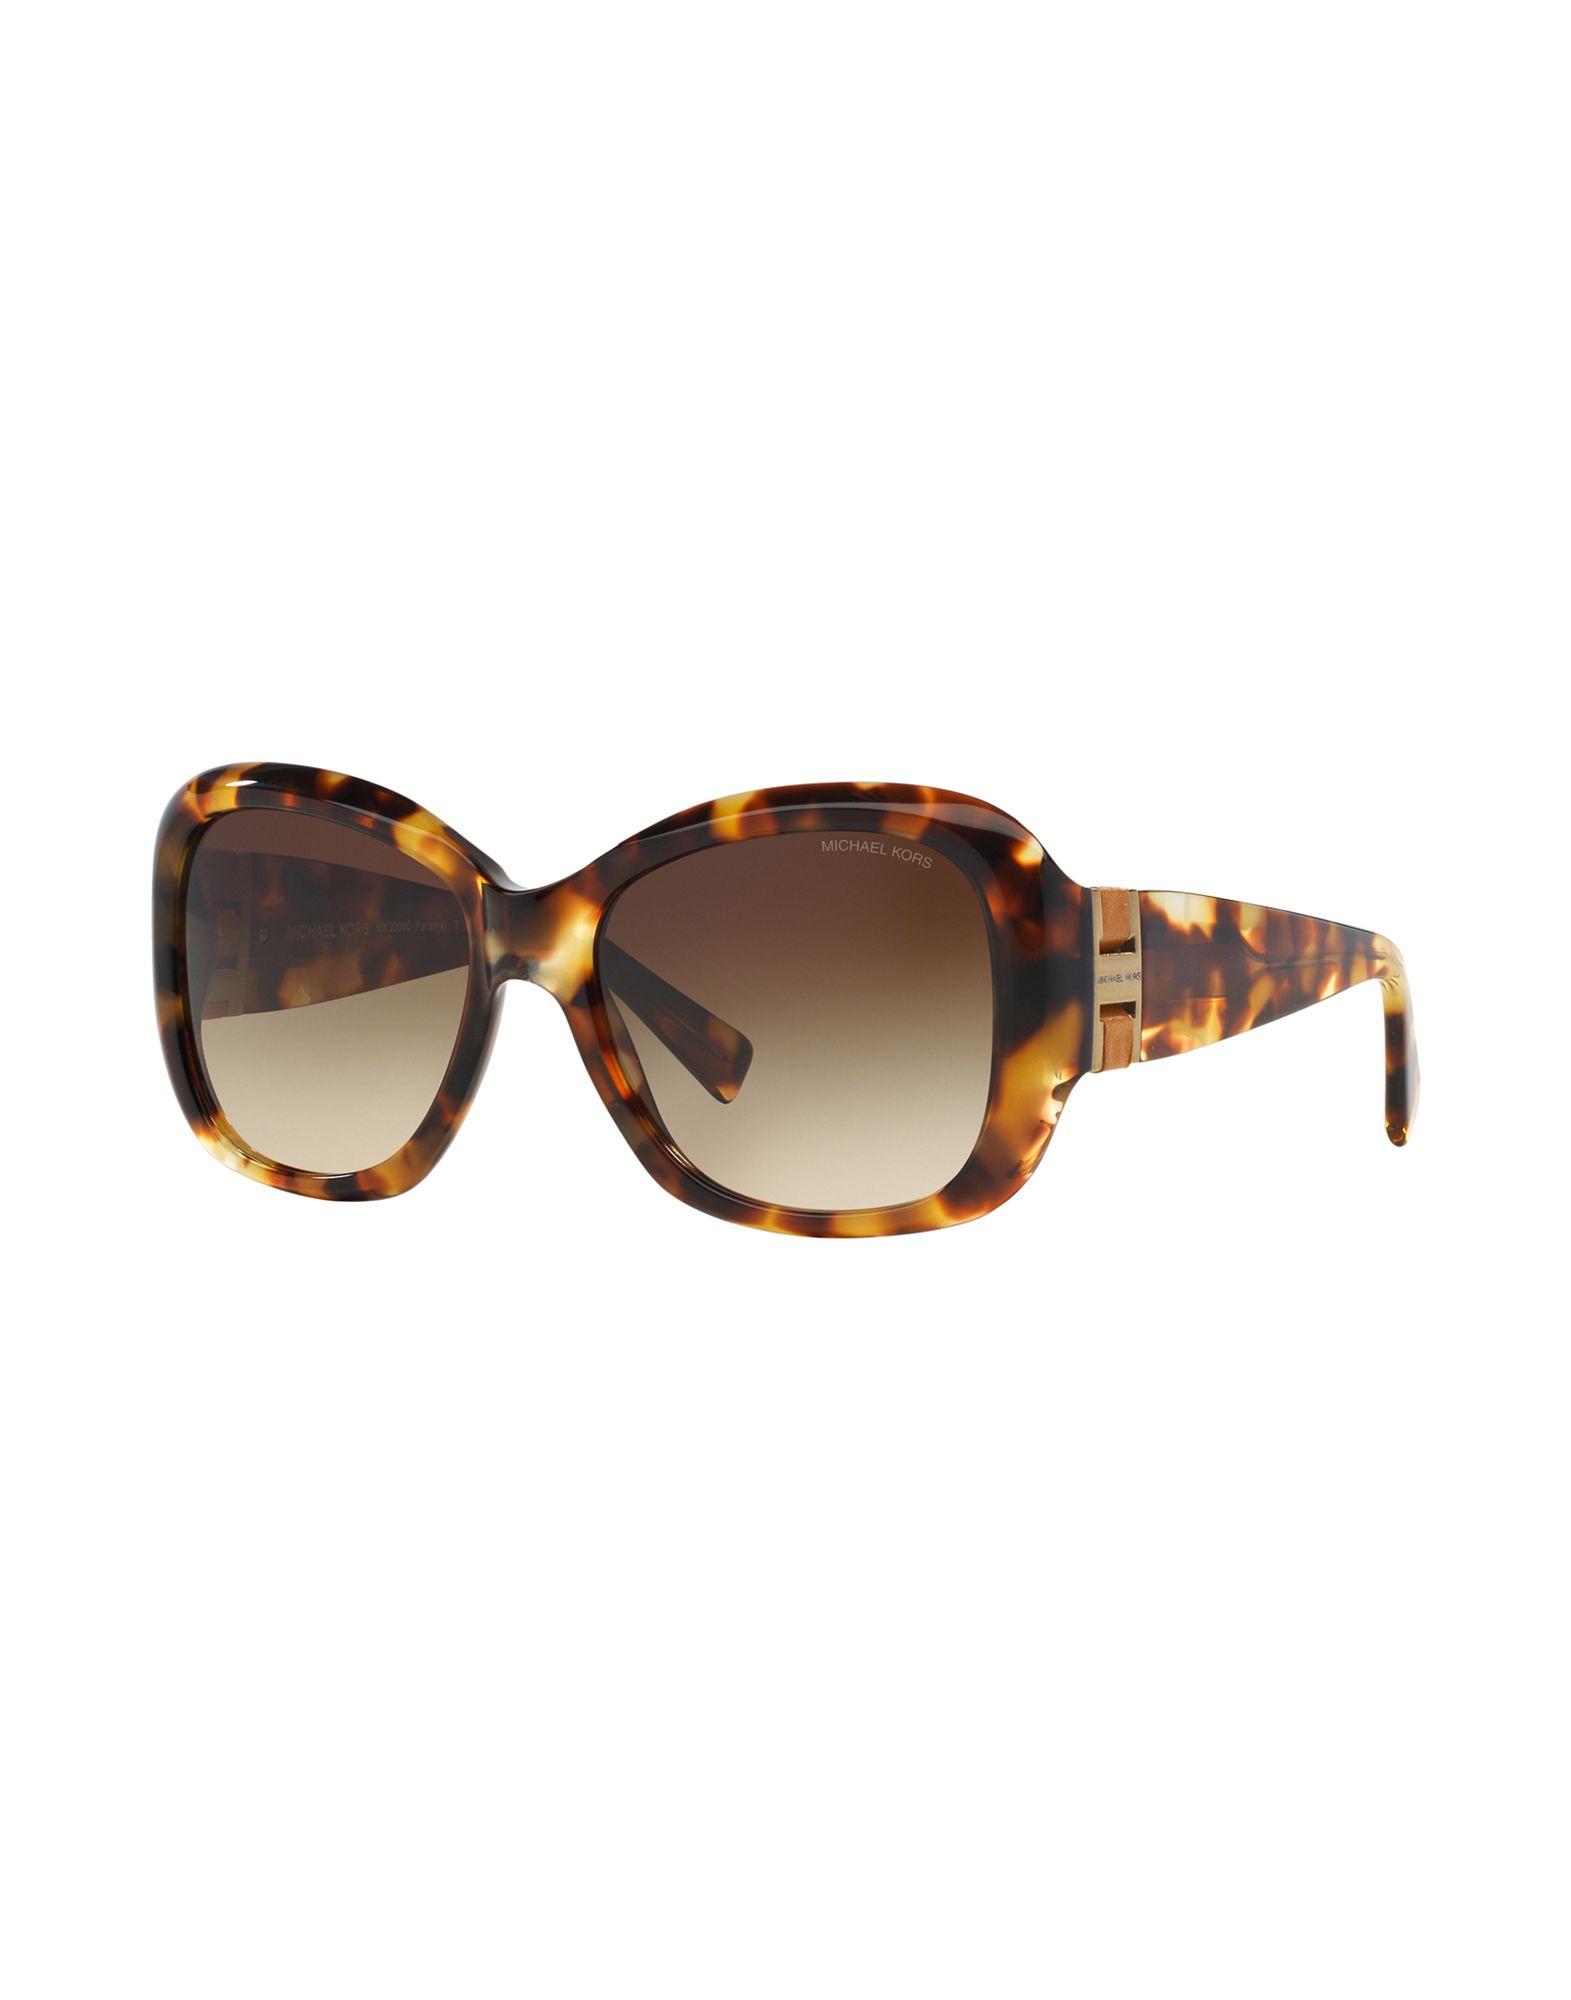 michael kors female michael kors sunglasses